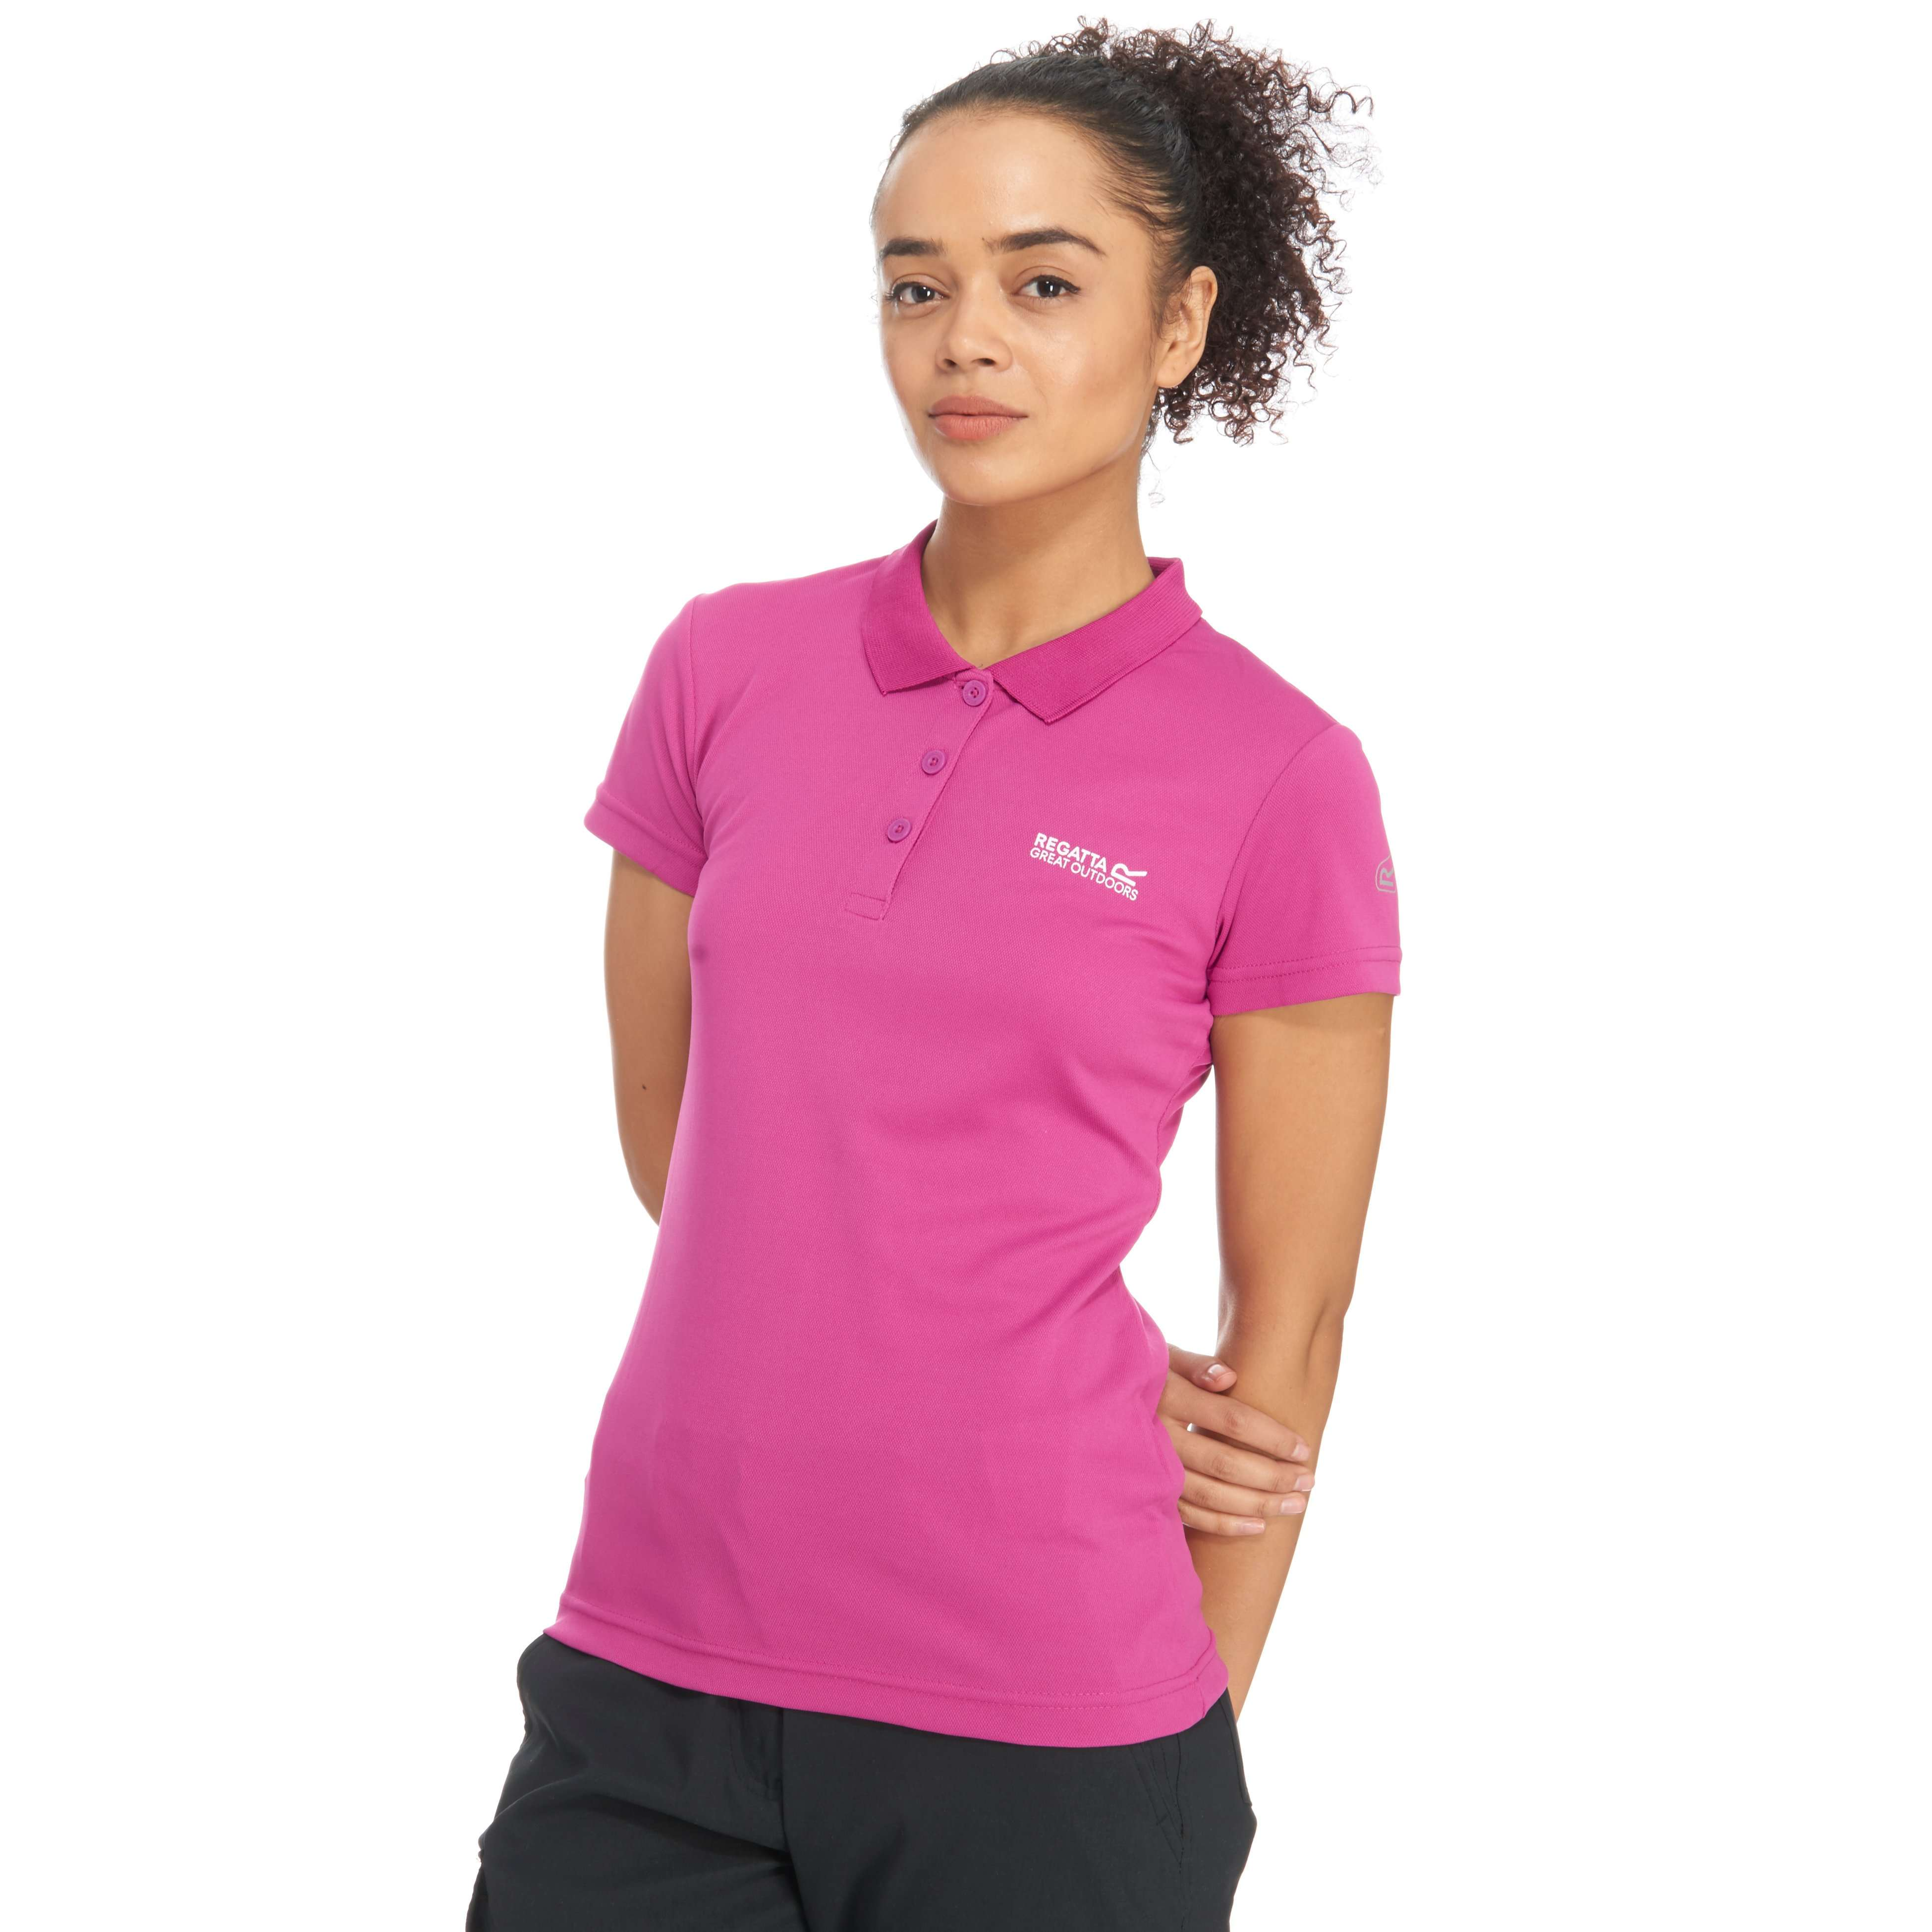 REGATTA Women's Maverik III Polo Shirt